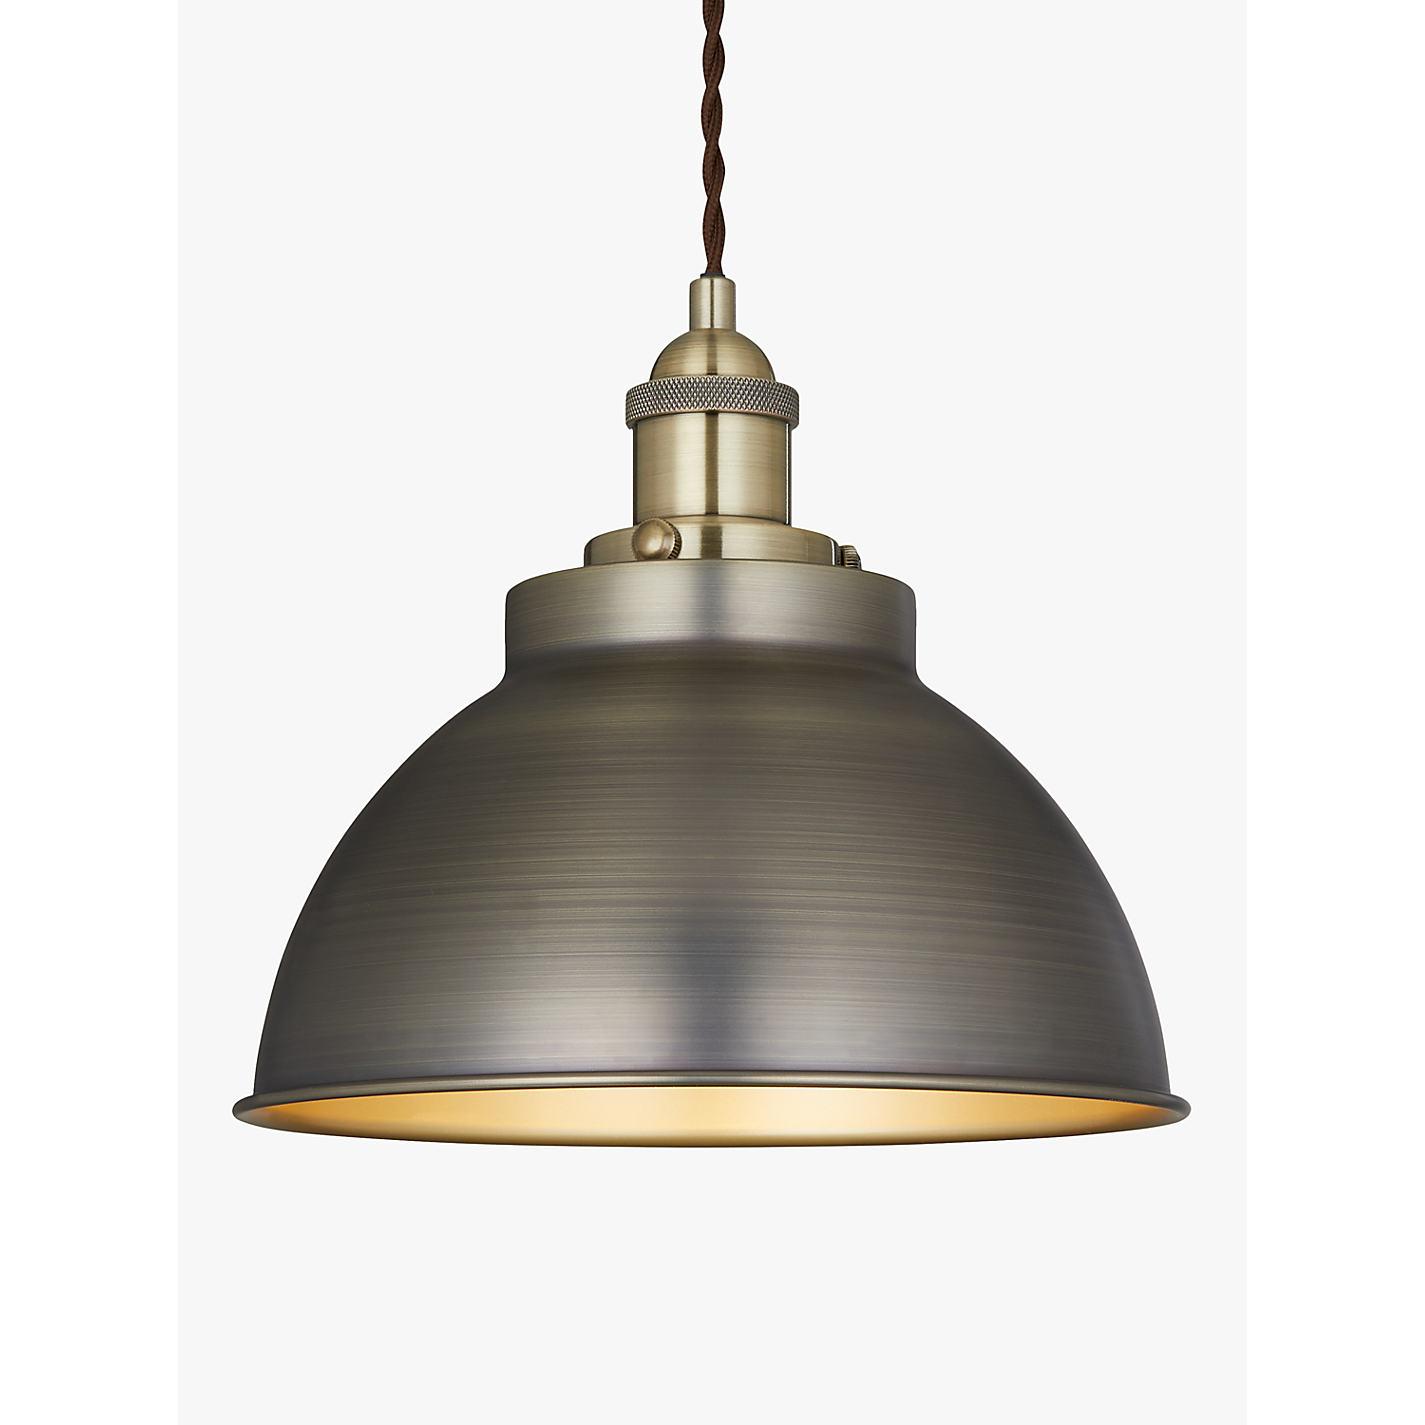 Buy john lewis baldwin pendant ceiling light john lewis buy john lewis baldwin pendant ceiling light online at johnlewis mozeypictures Choice Image